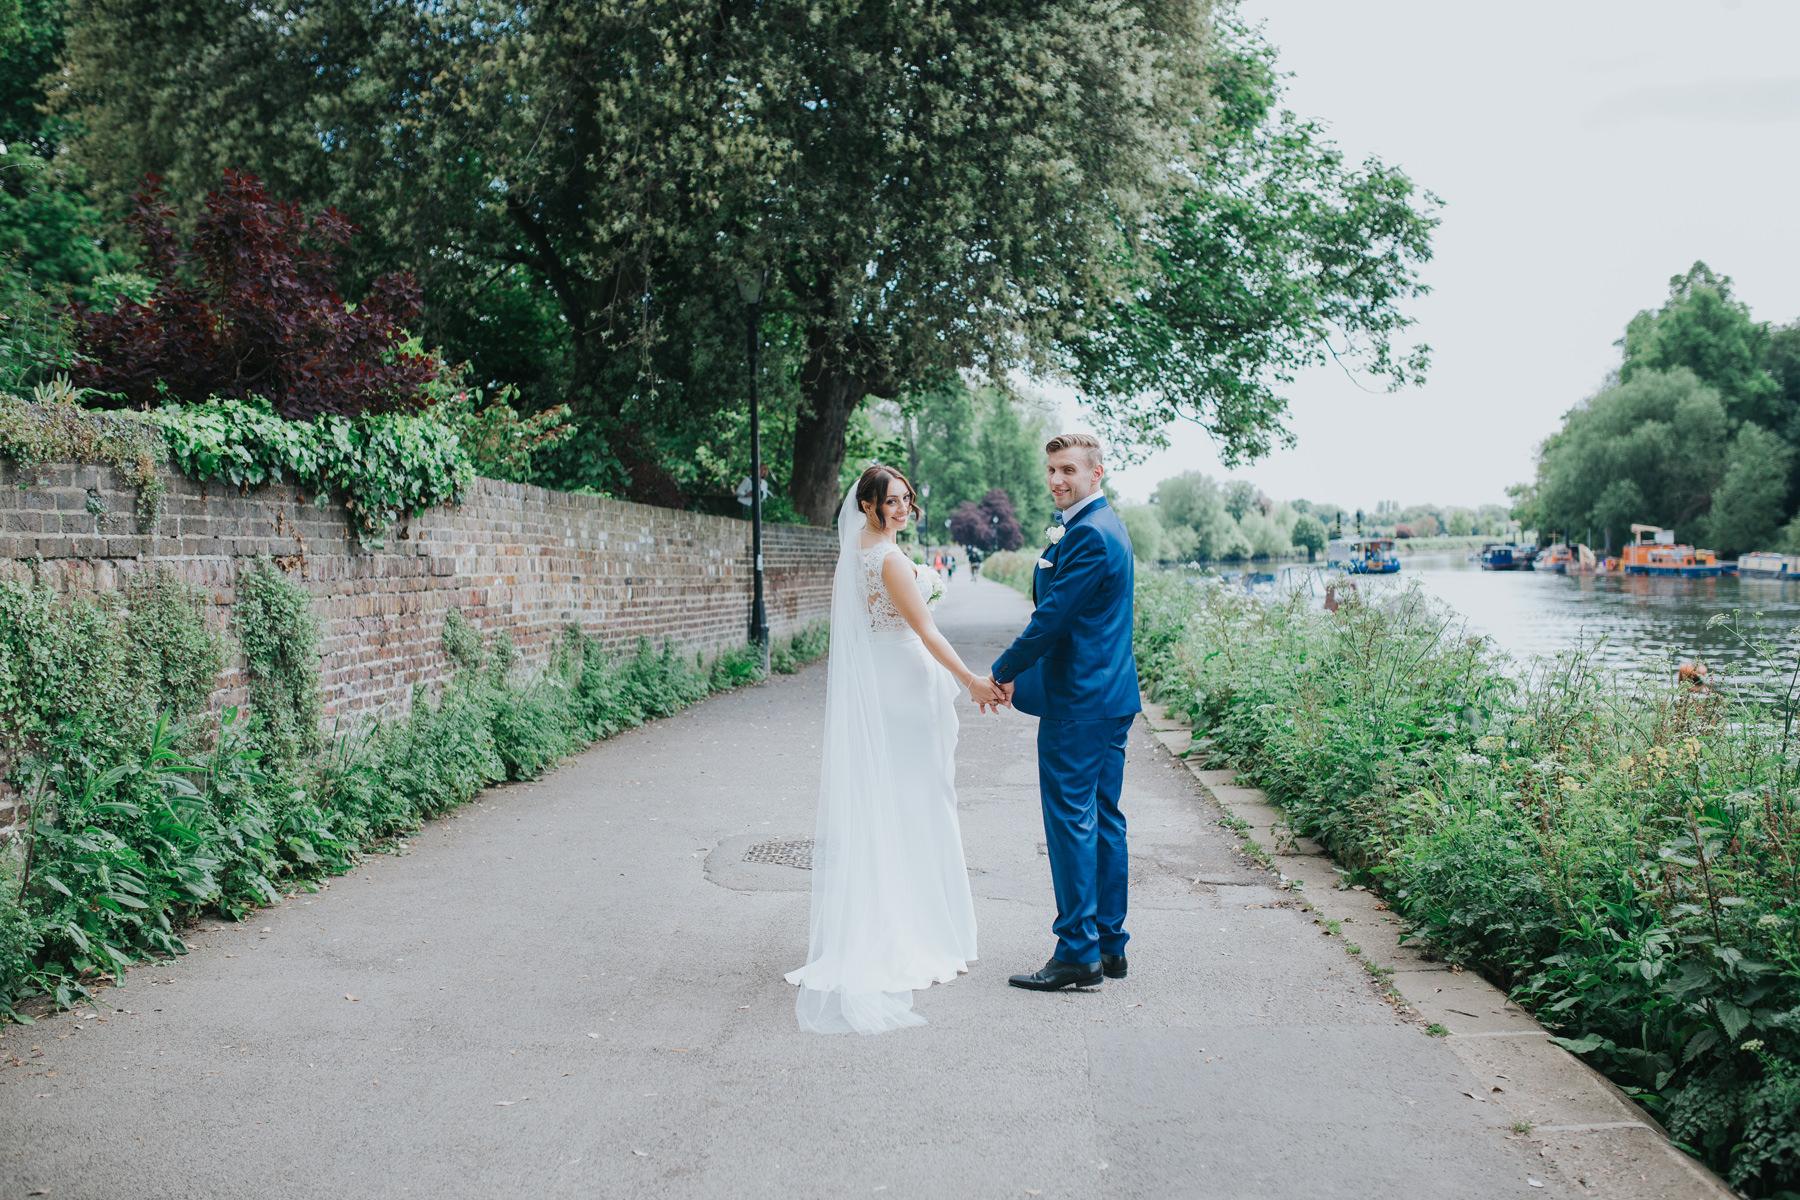 CRL-363-The Bingham wedding Richmond-Claire Rob bridal couple portraits on Thamespath.jpg